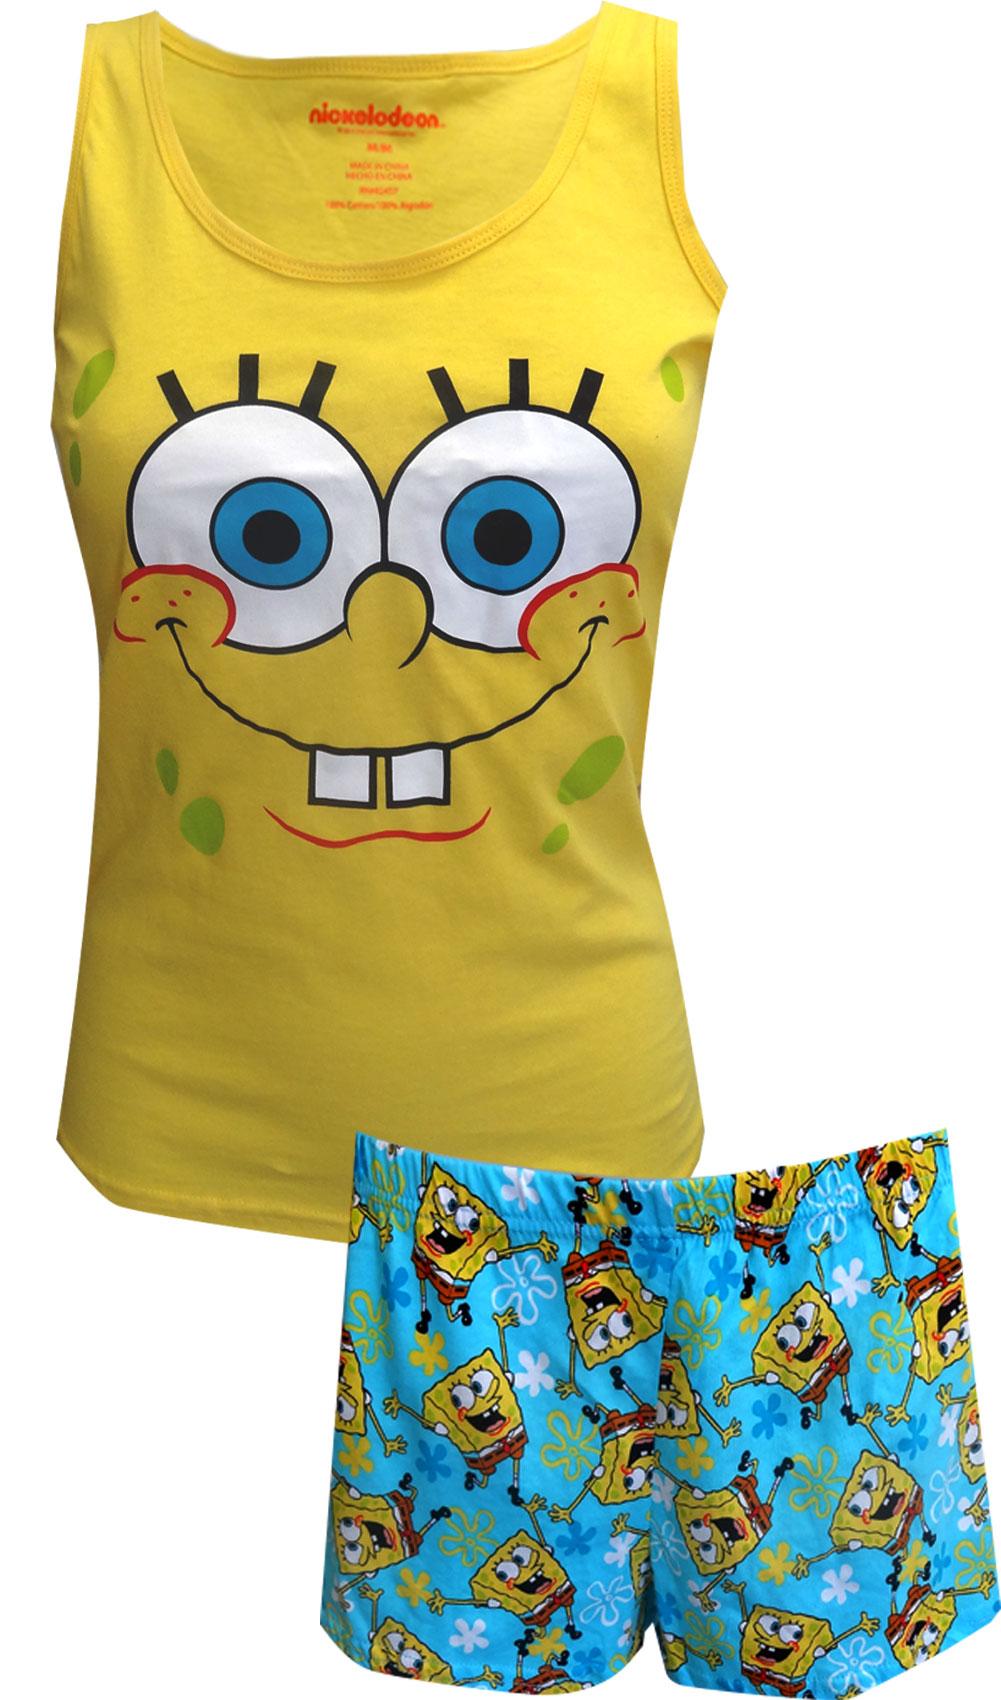 nickelodeon spongebob cotton shortie pajama walmart com